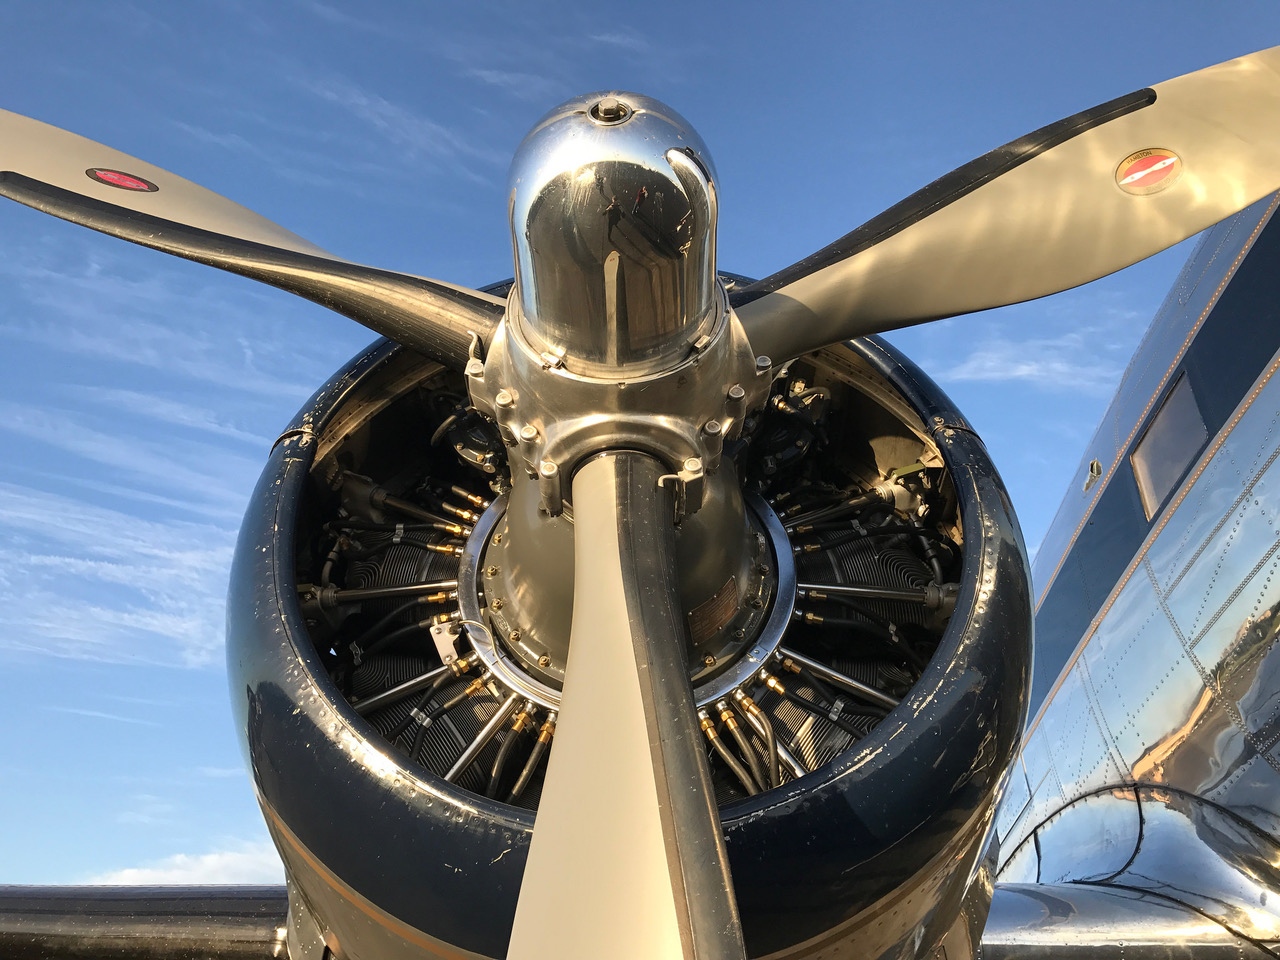 Pratt Whitney  R-1830-94 : 1,350 hp (1,007 kW)